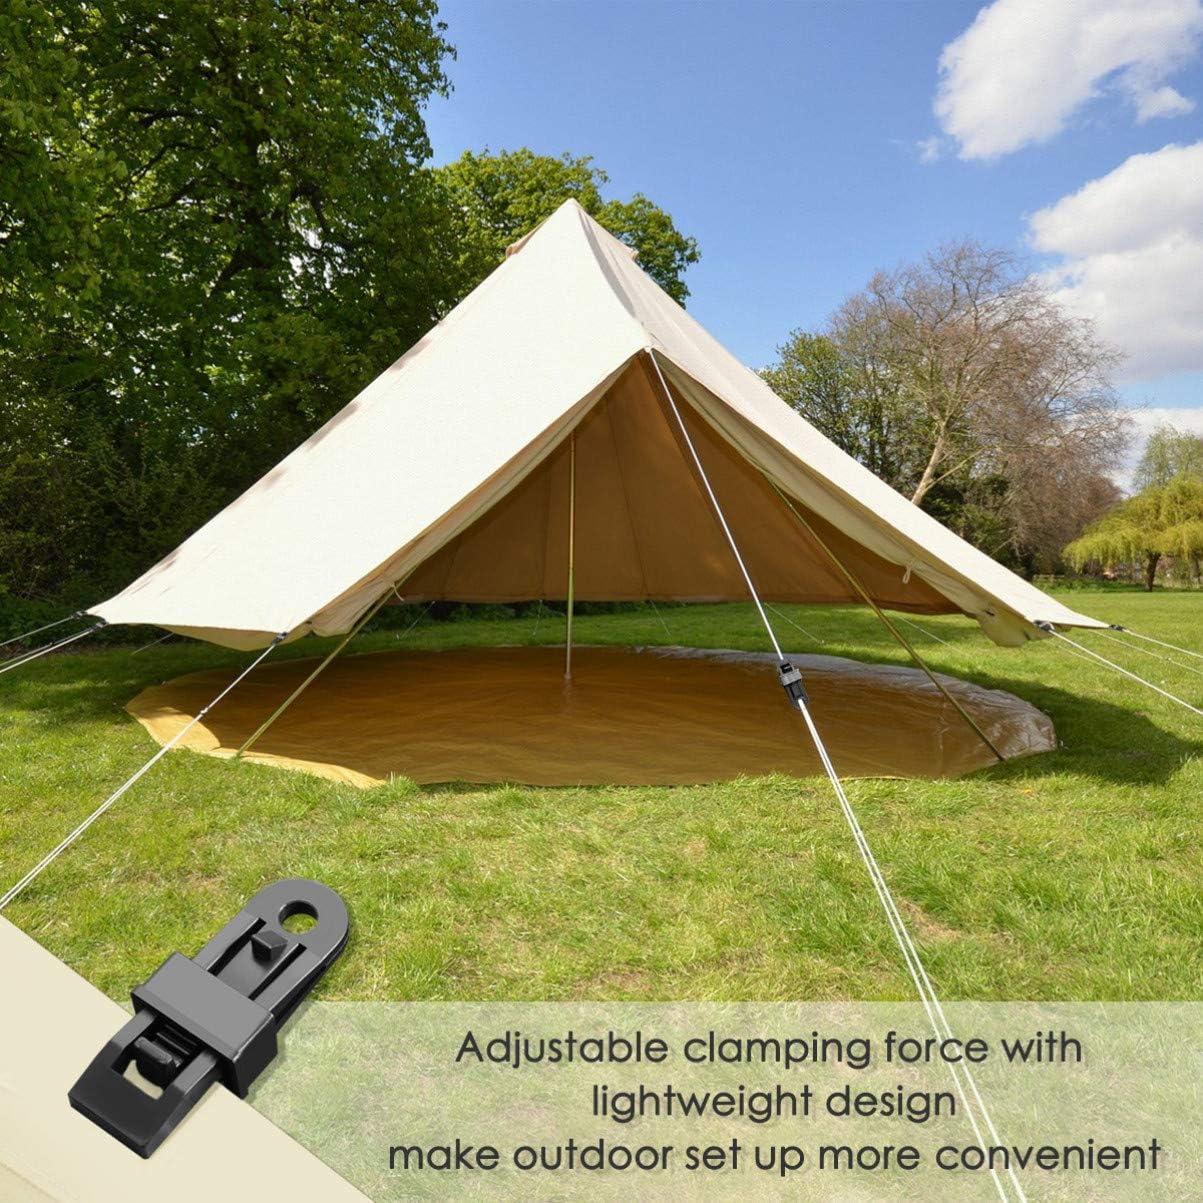 15x Reusable Tent Tarp Tarpaulin Alligator Mouth Clip Clamp Camping Heavy Duty